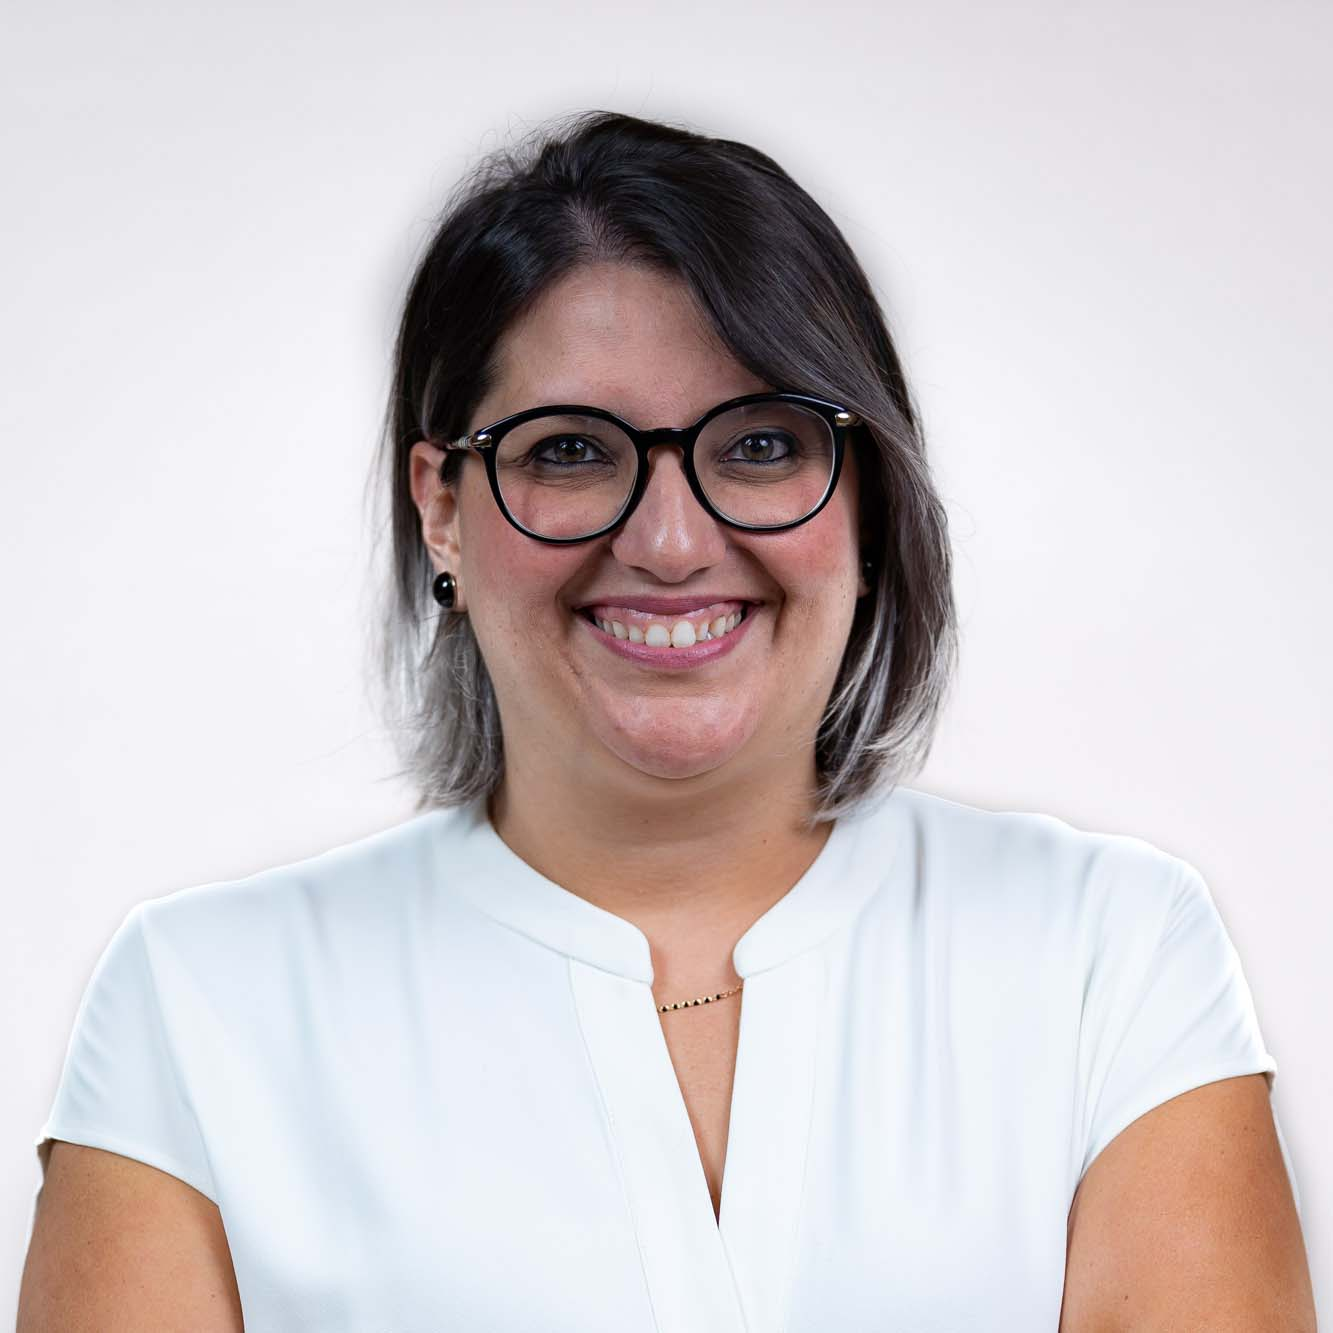 Dott.ssa Liviana Sciacca